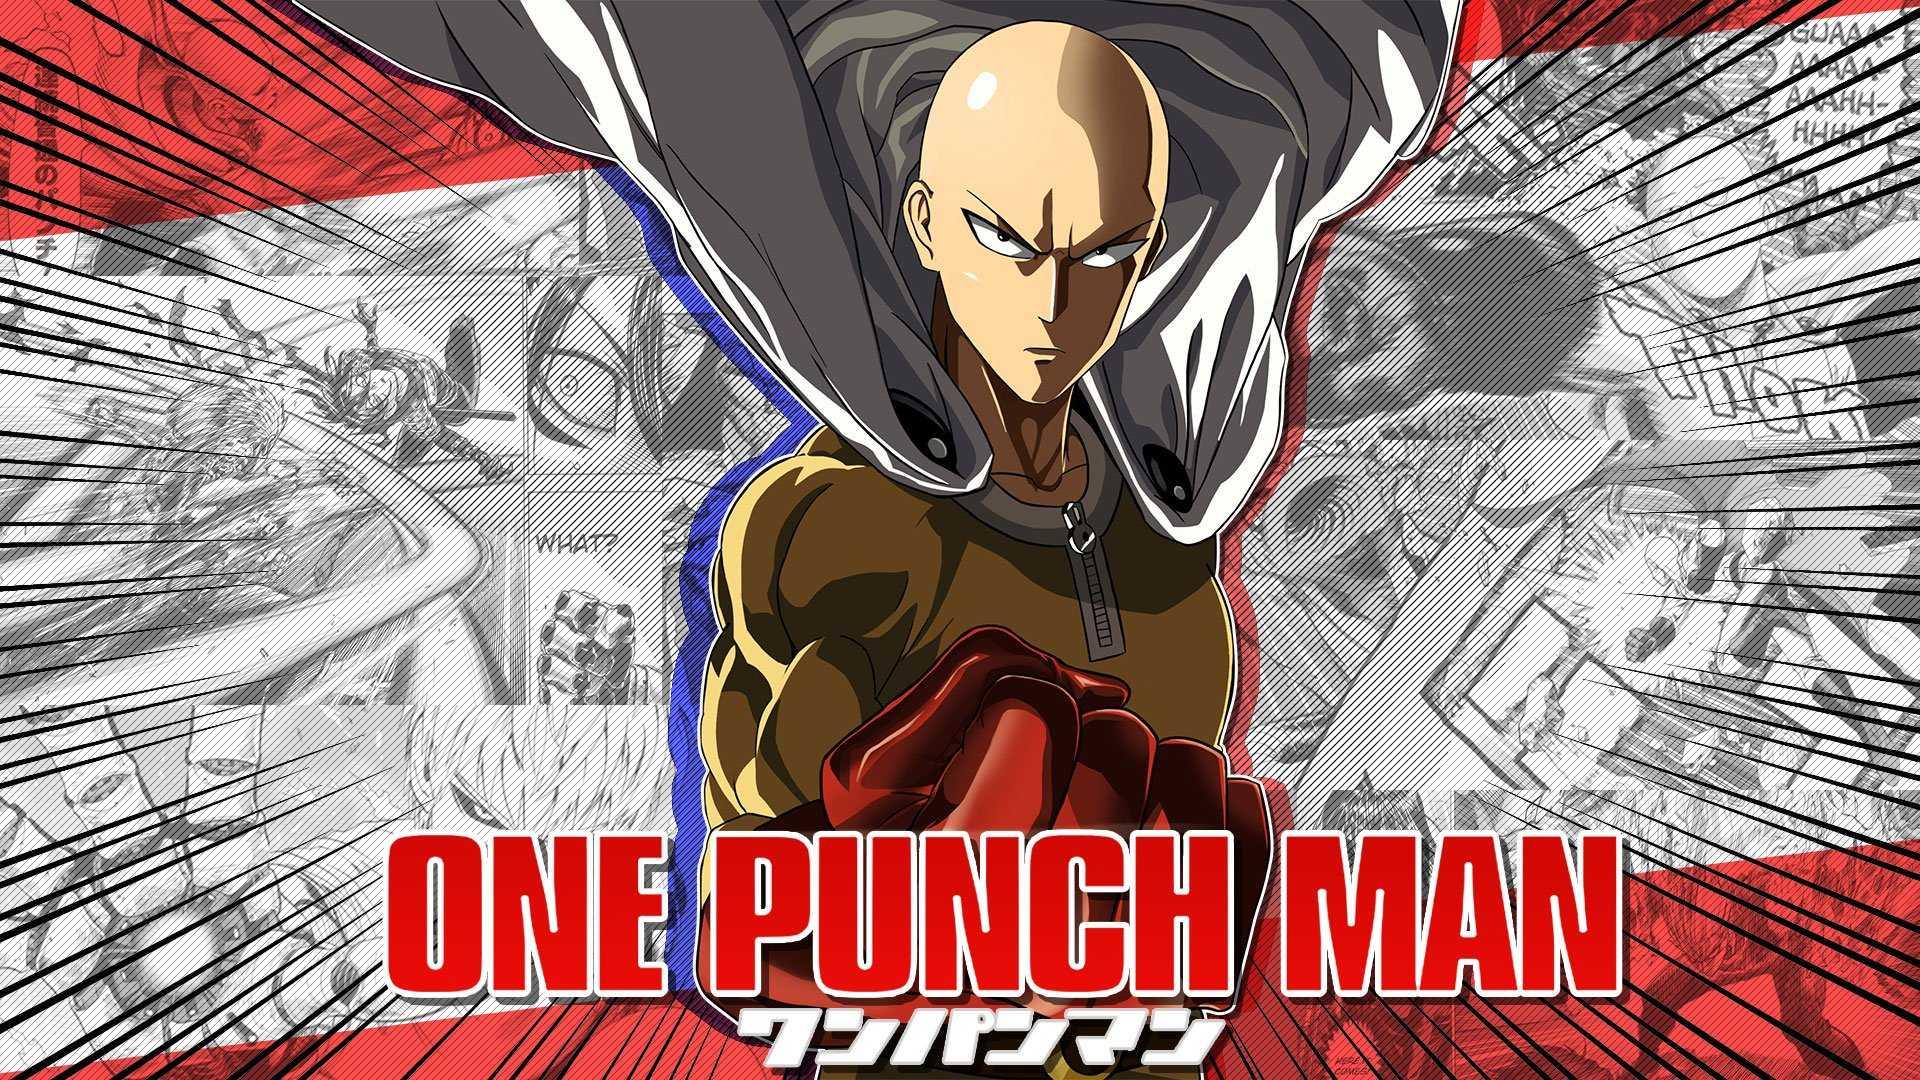 One Punch Man Season 1 BluRay Dual Audio [English-Japanese] DD2.0 480p, 720p & 1080p HD   10bit HEVC ESubs